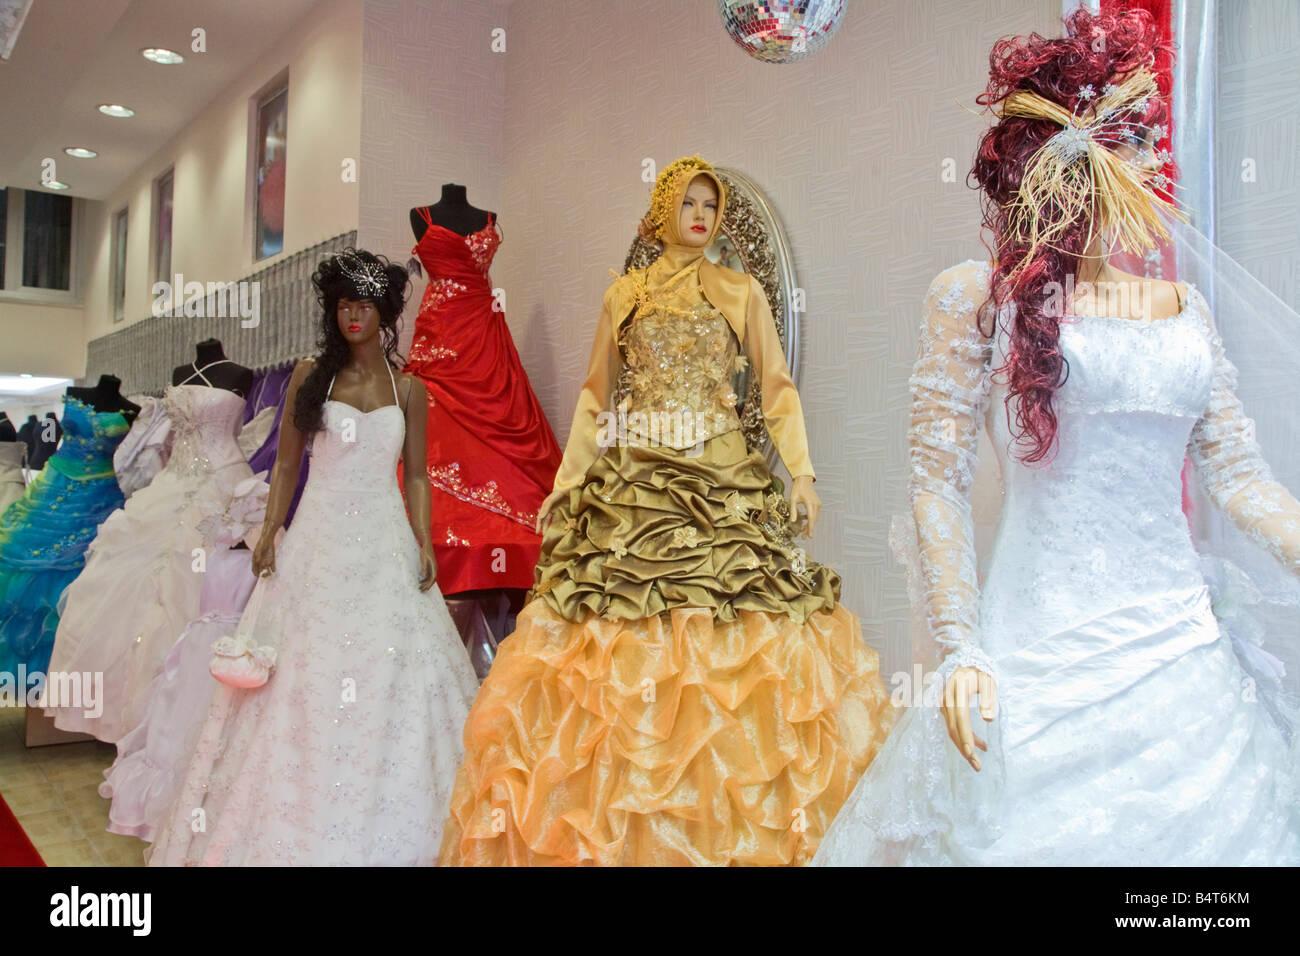 Turkey Wedding Dress Shop Stock Photos & Turkey Wedding Dress Shop ...